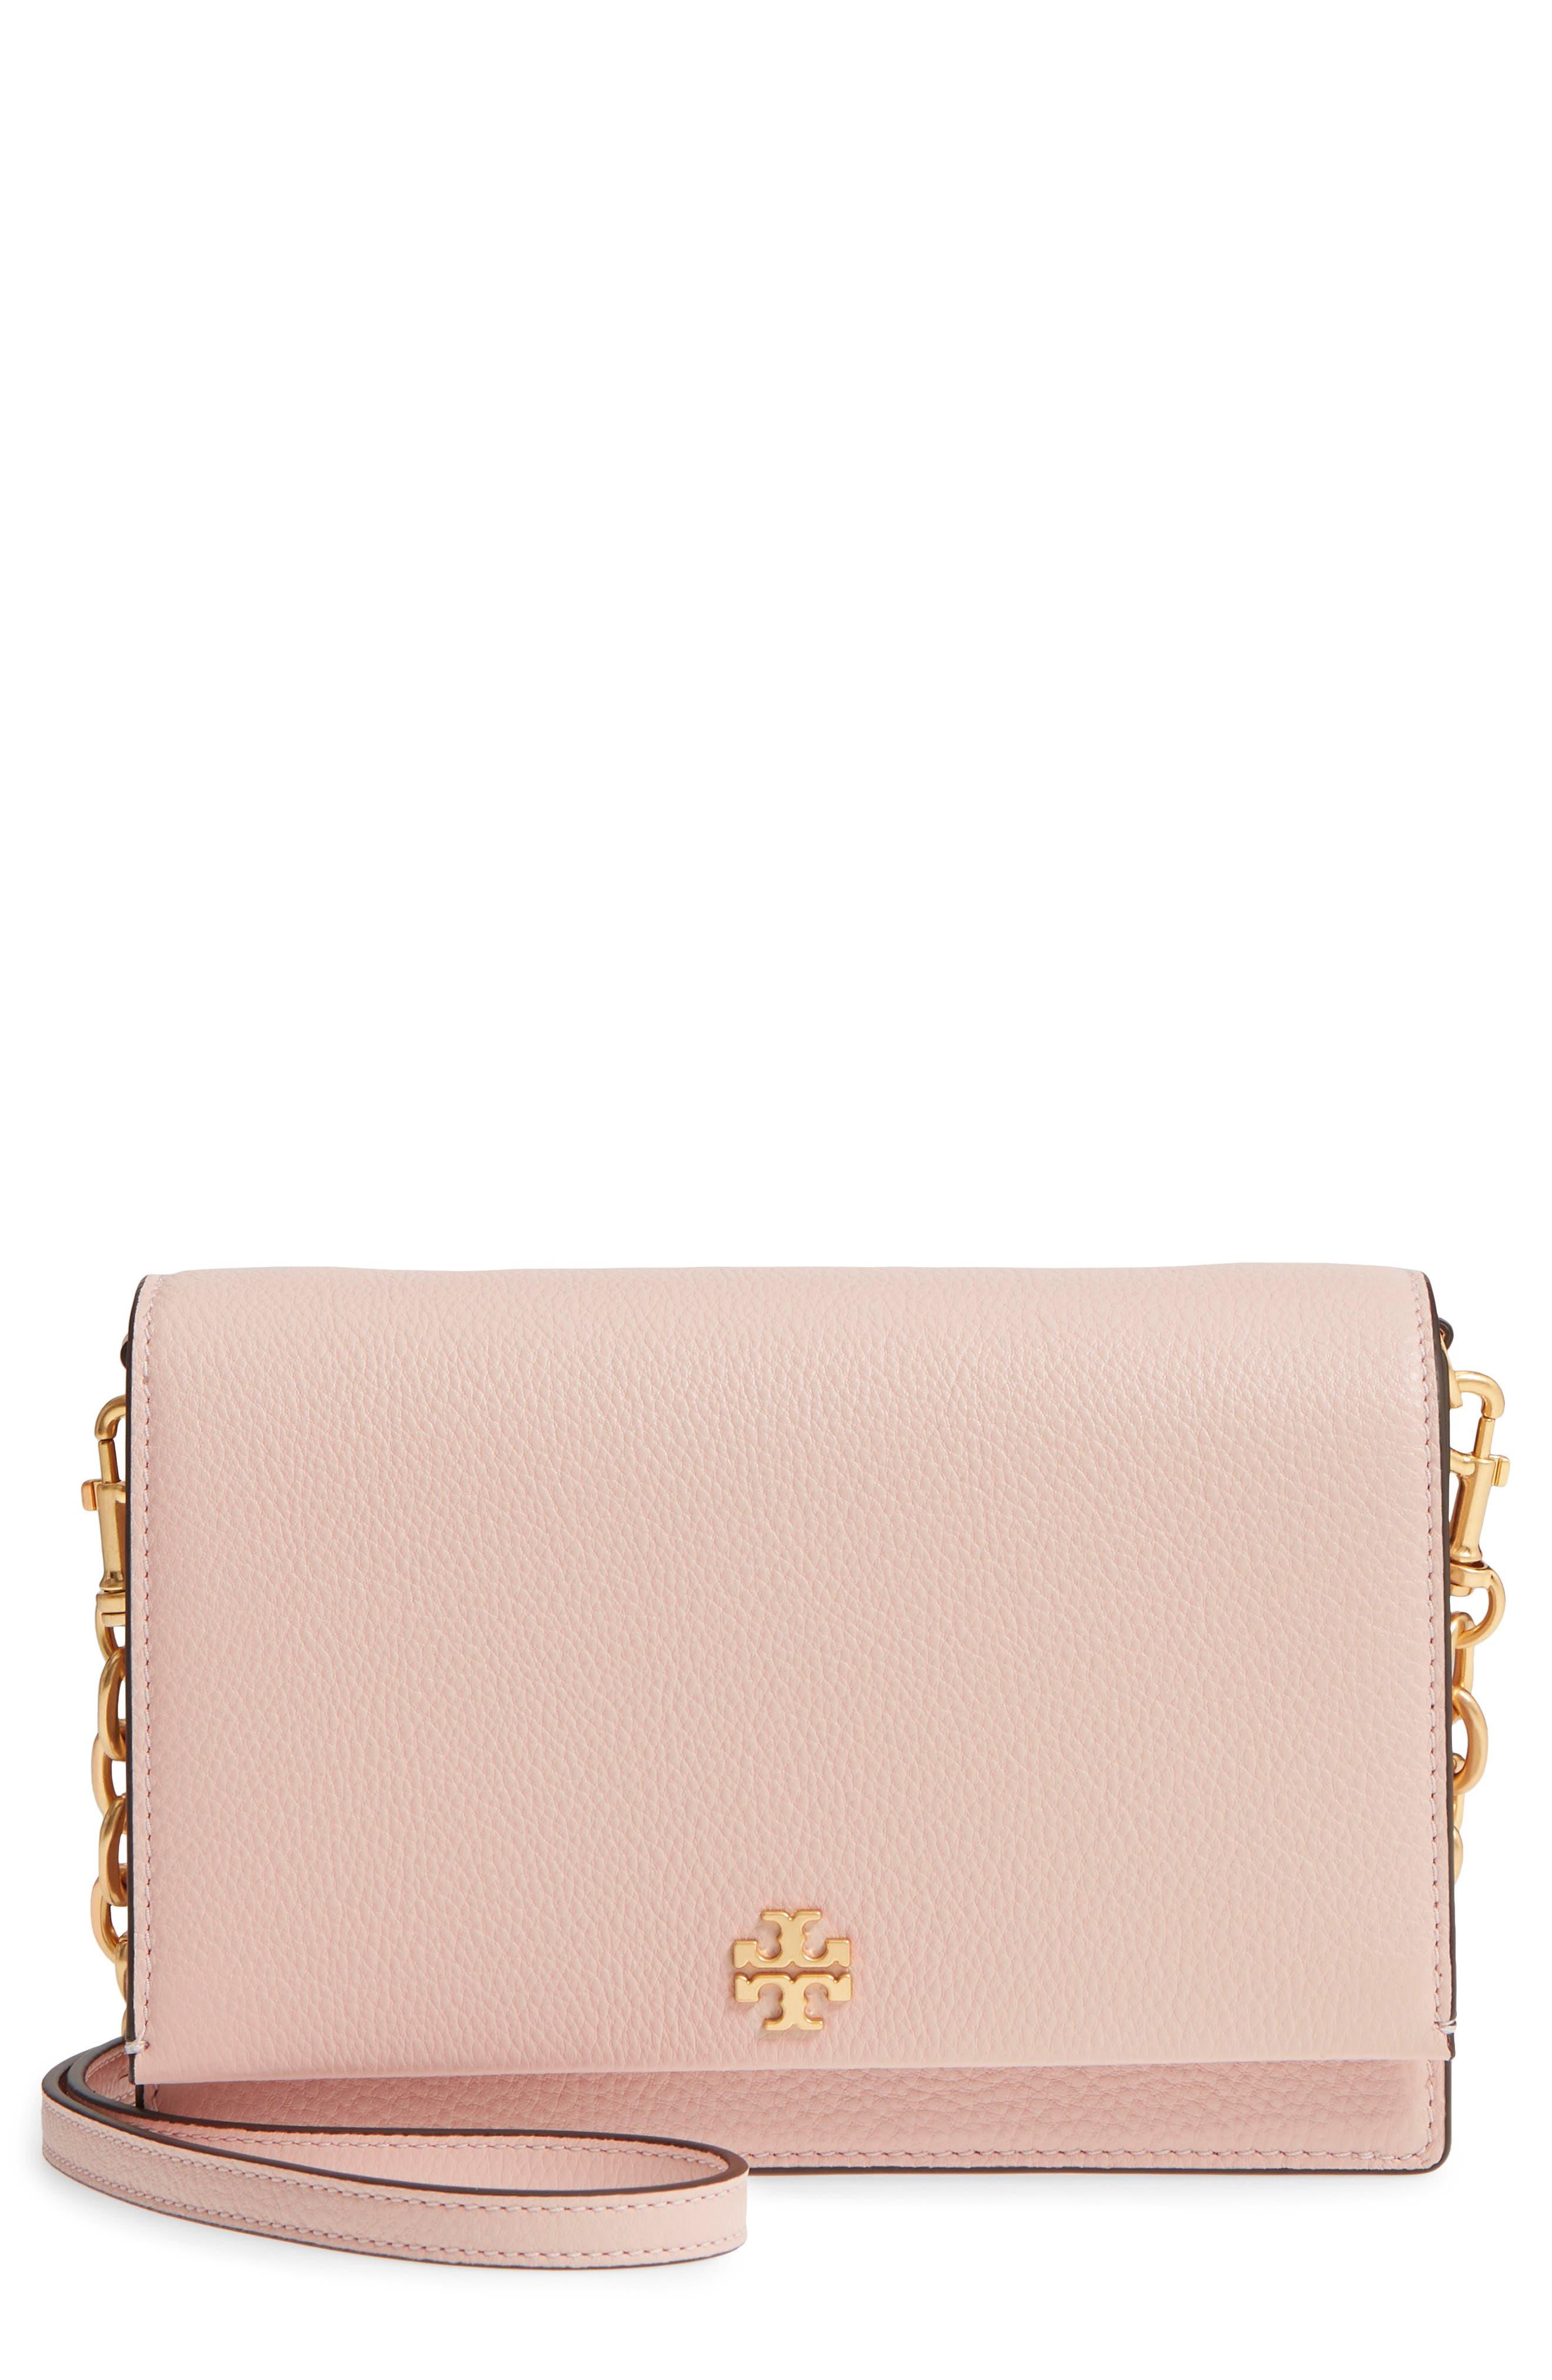 Georgia Pebble Leather Shoulder Bag,                         Main,                         color, Shell Pink